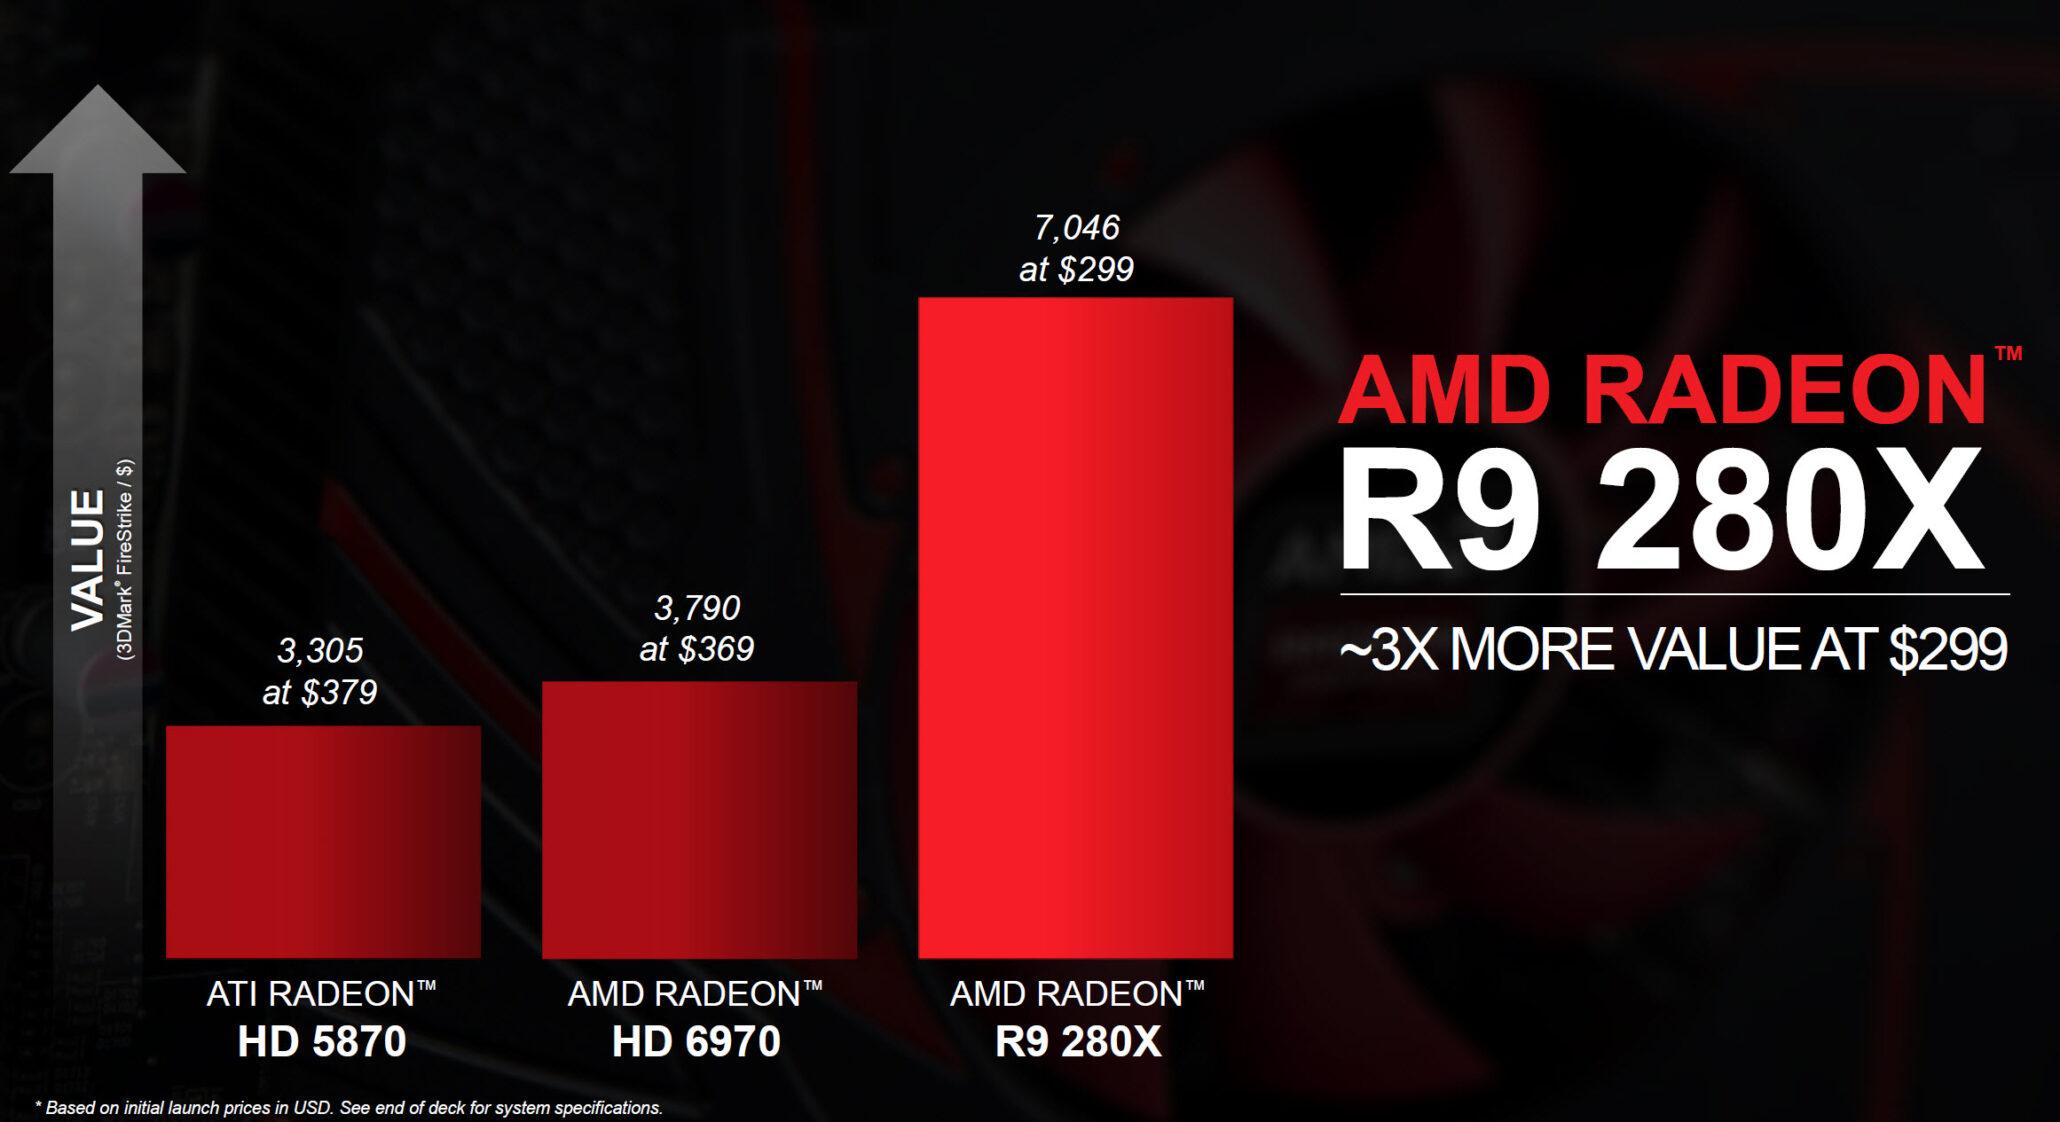 amd-radeon-r9-280x-performance